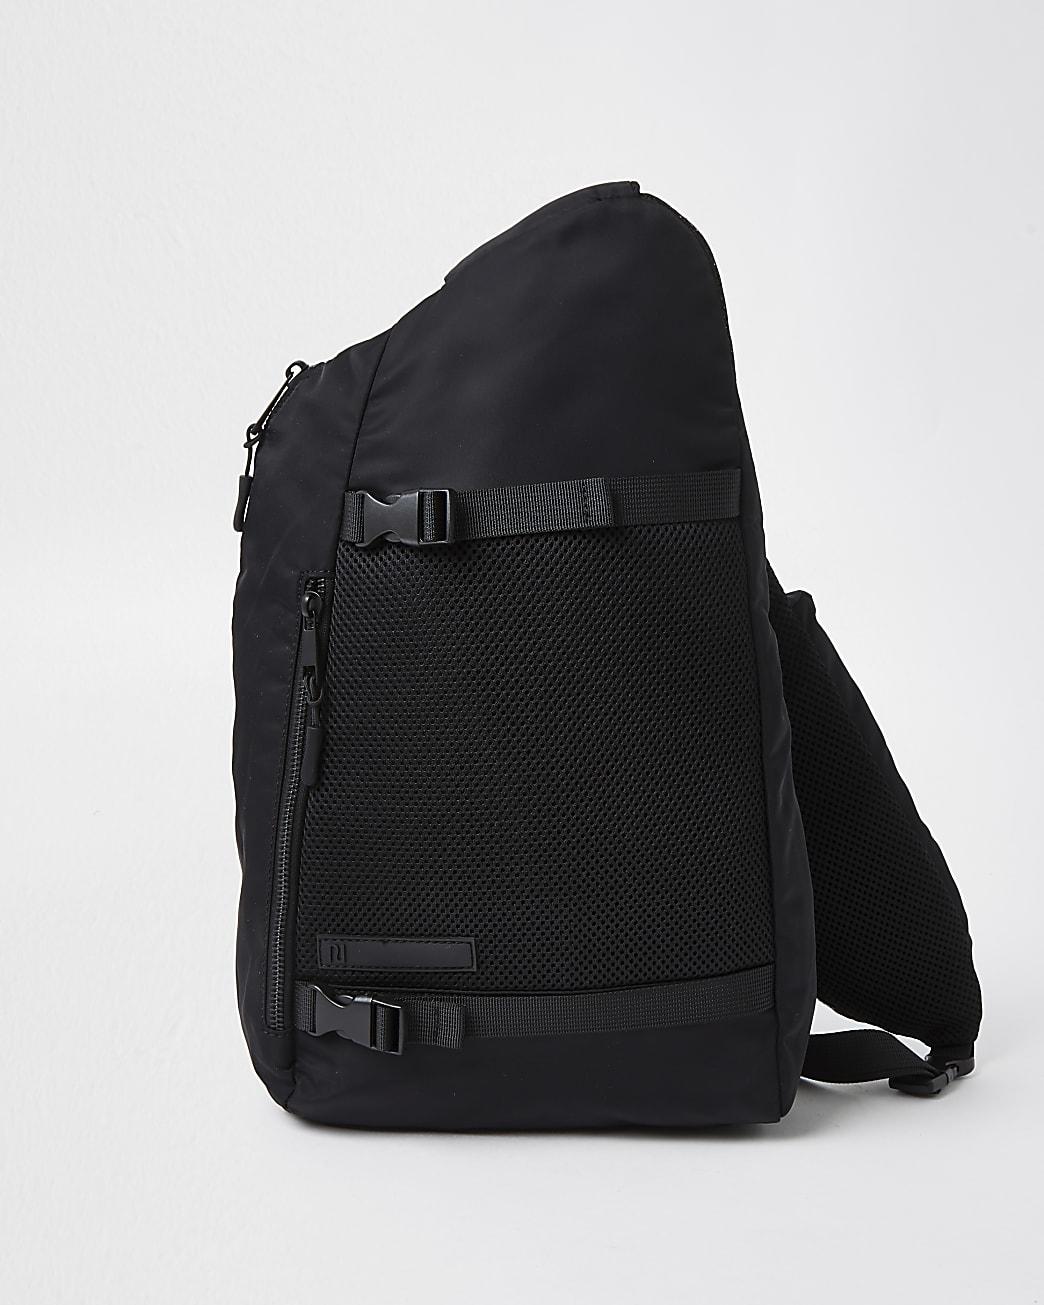 Black one strap rucksack